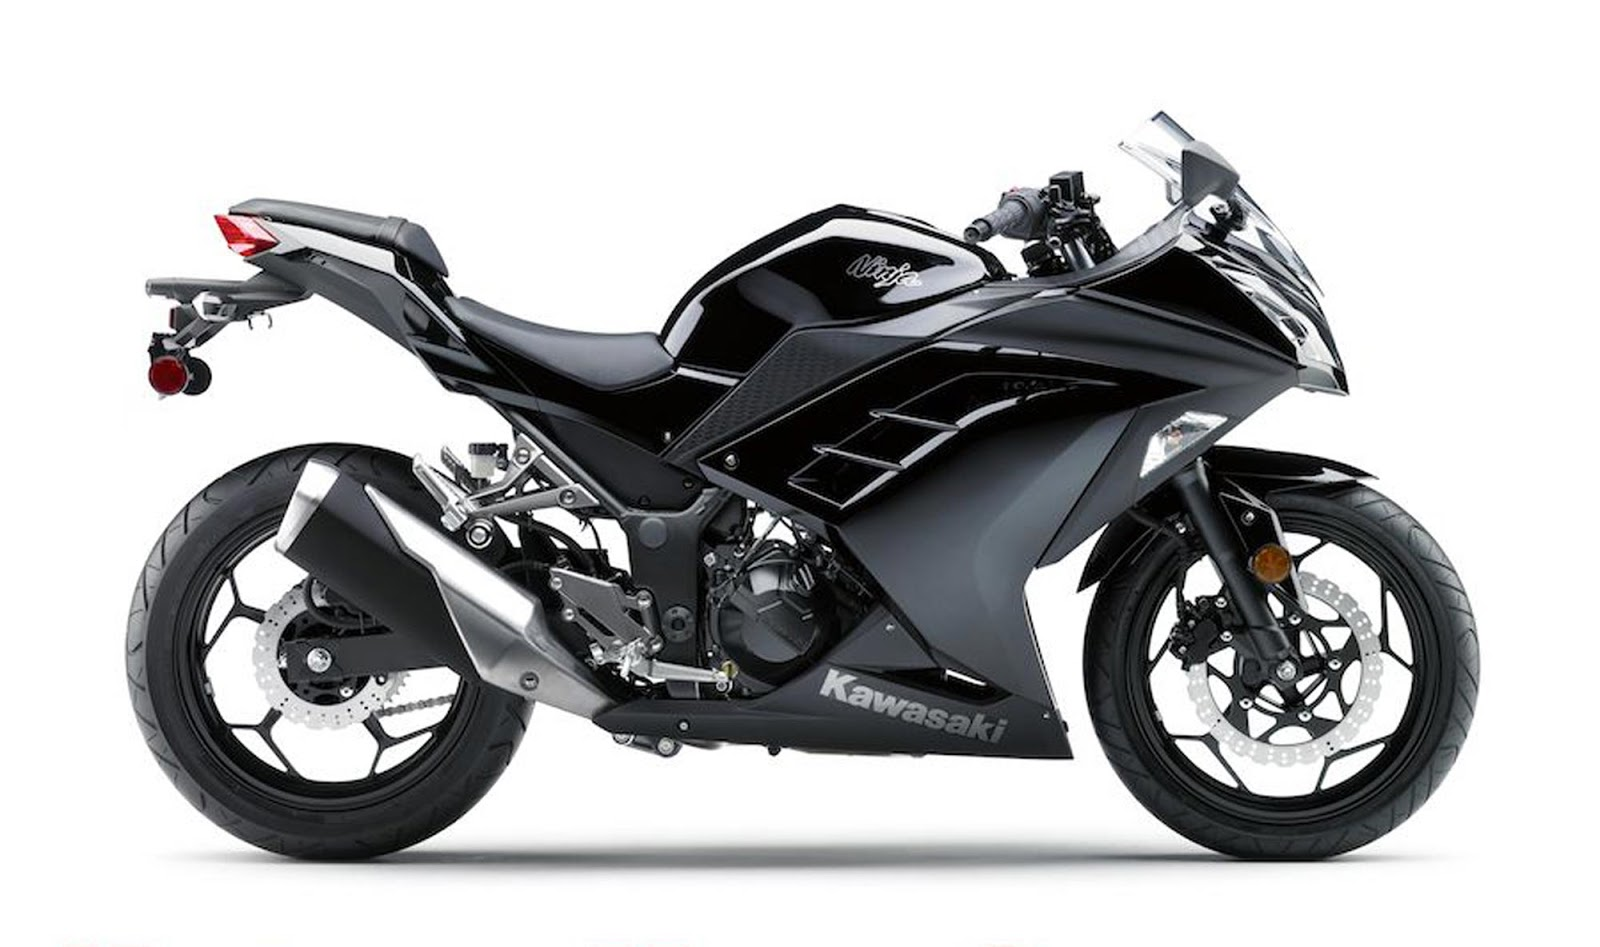 kawasaki motor bikes 2013 kawasaki ninja 300 special edition abs